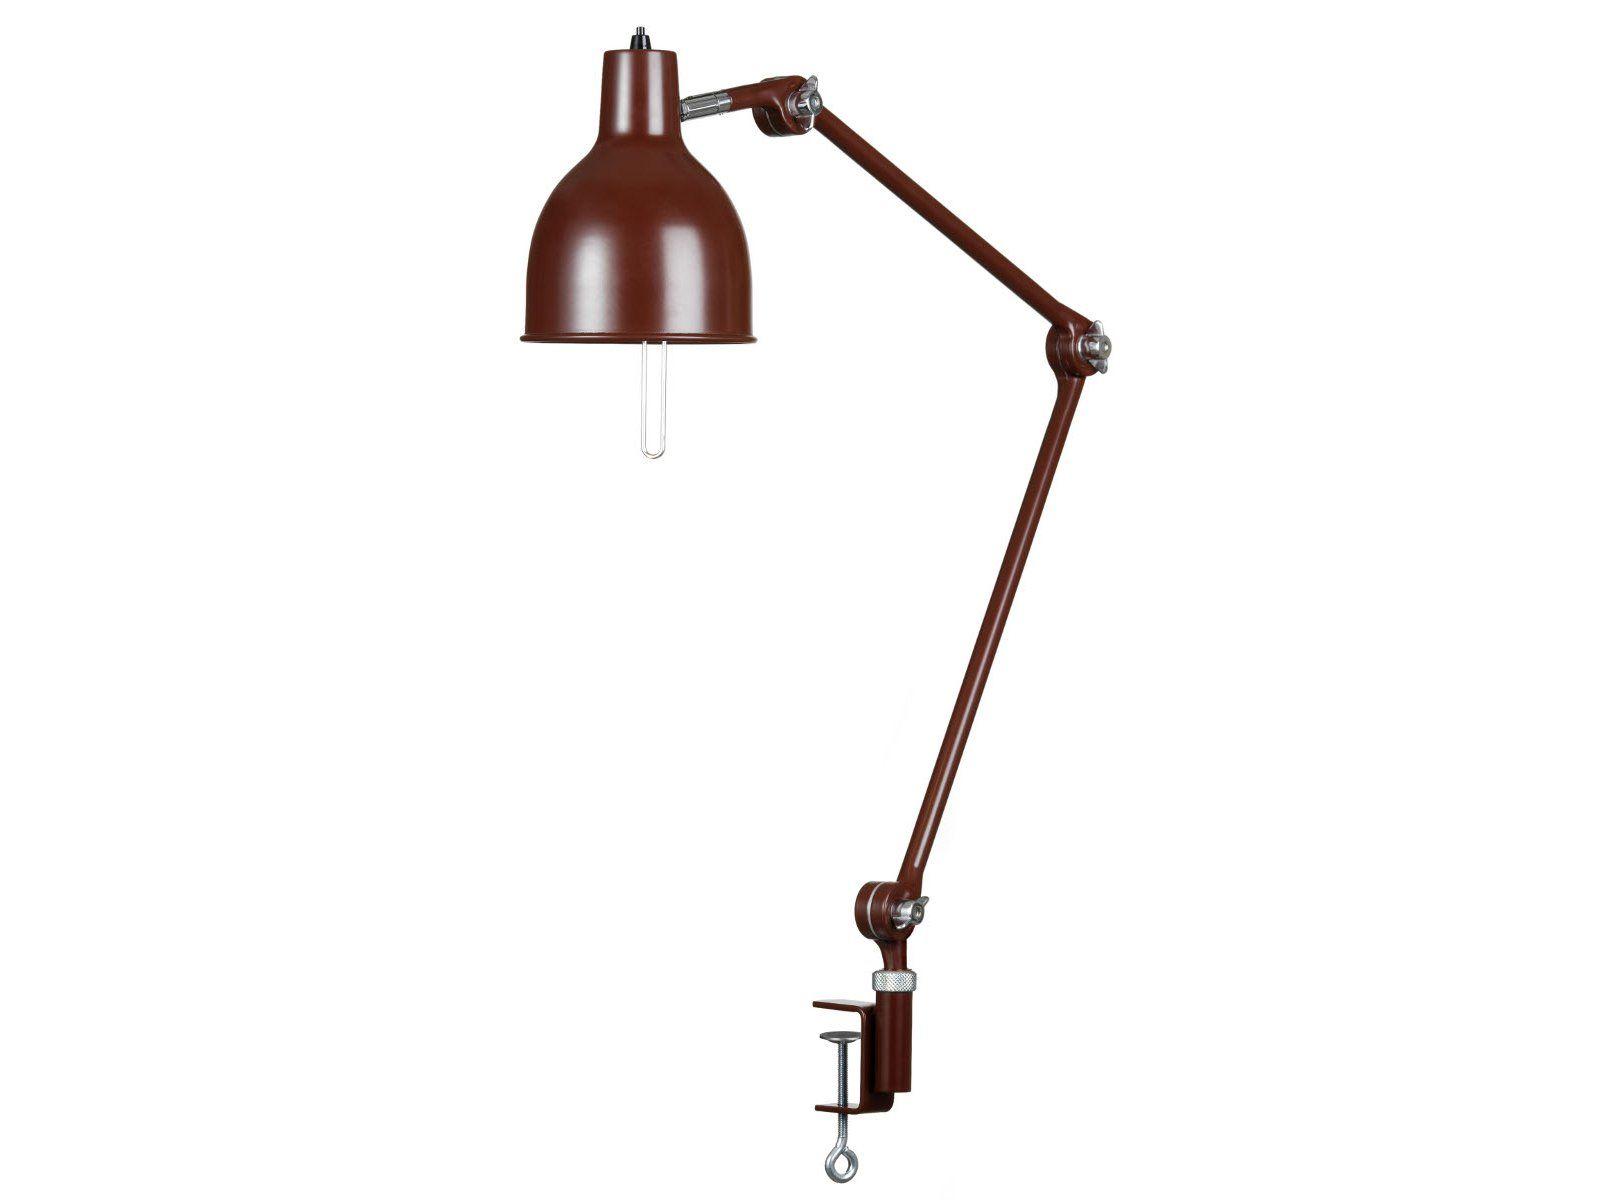 lampe de table en m tal maill bras articul pj65 by. Black Bedroom Furniture Sets. Home Design Ideas